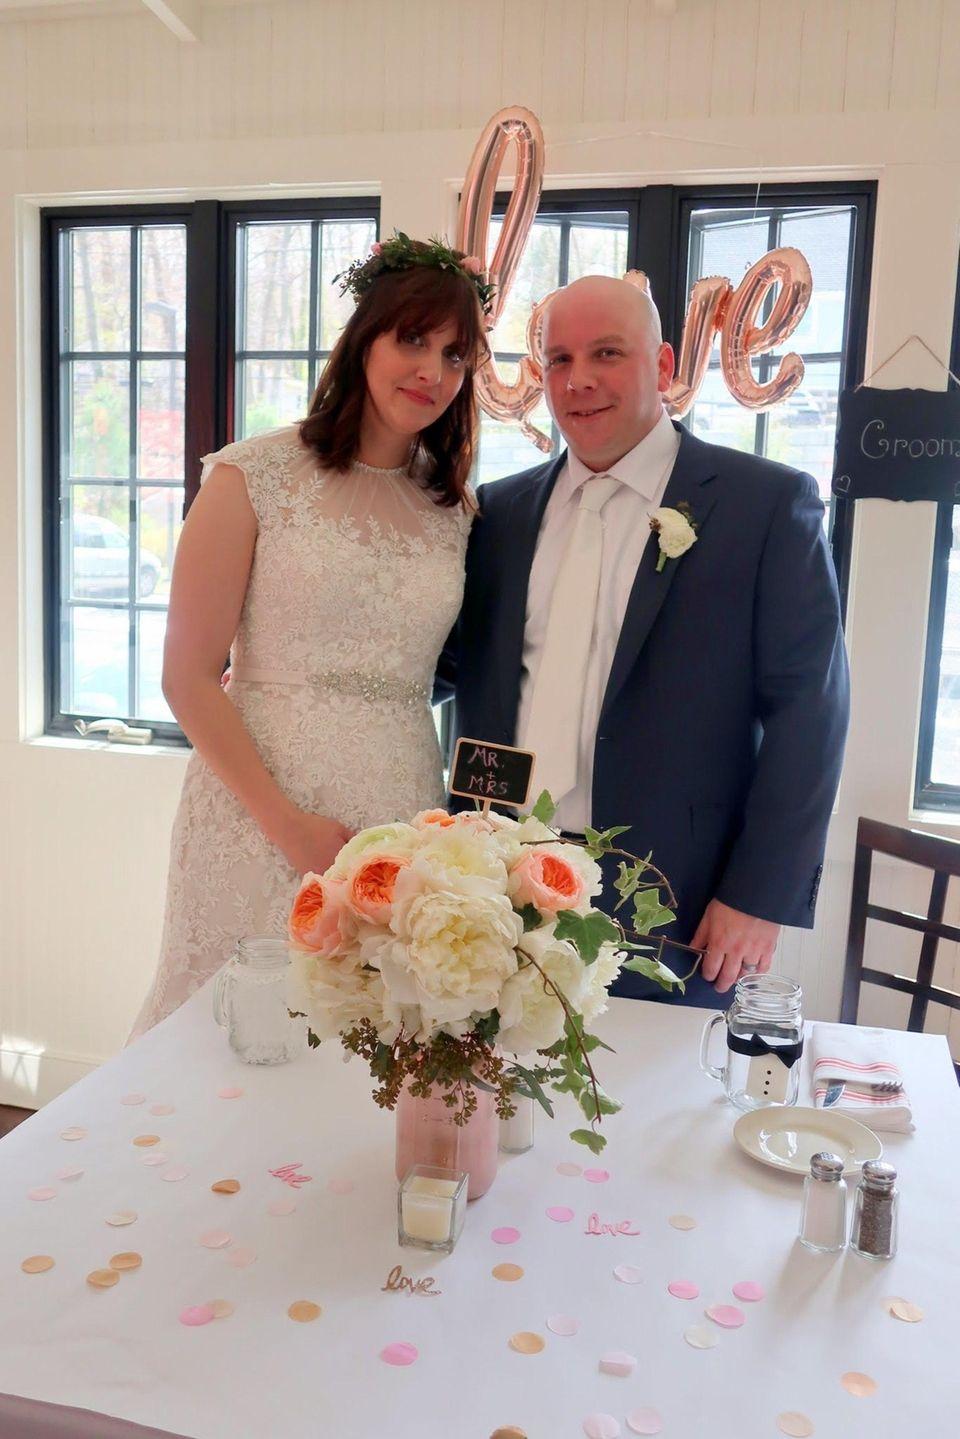 Jennifer and Kevin Graney, married April 23, 2017.